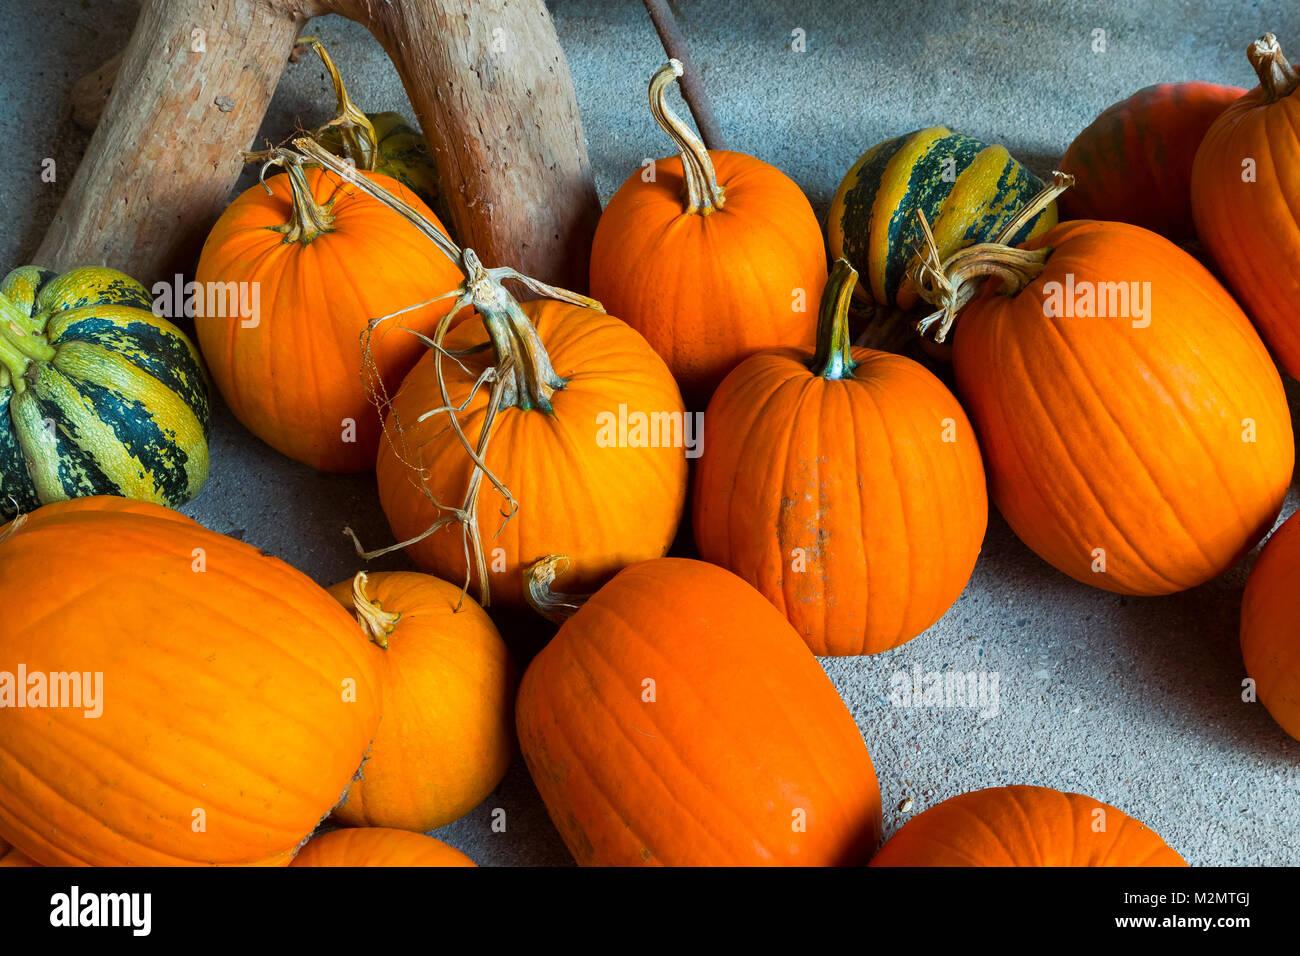 Autumn Pumpkin Thanksgiving and Halloween Background - orange pumpkins over wooden table. - Stock Image